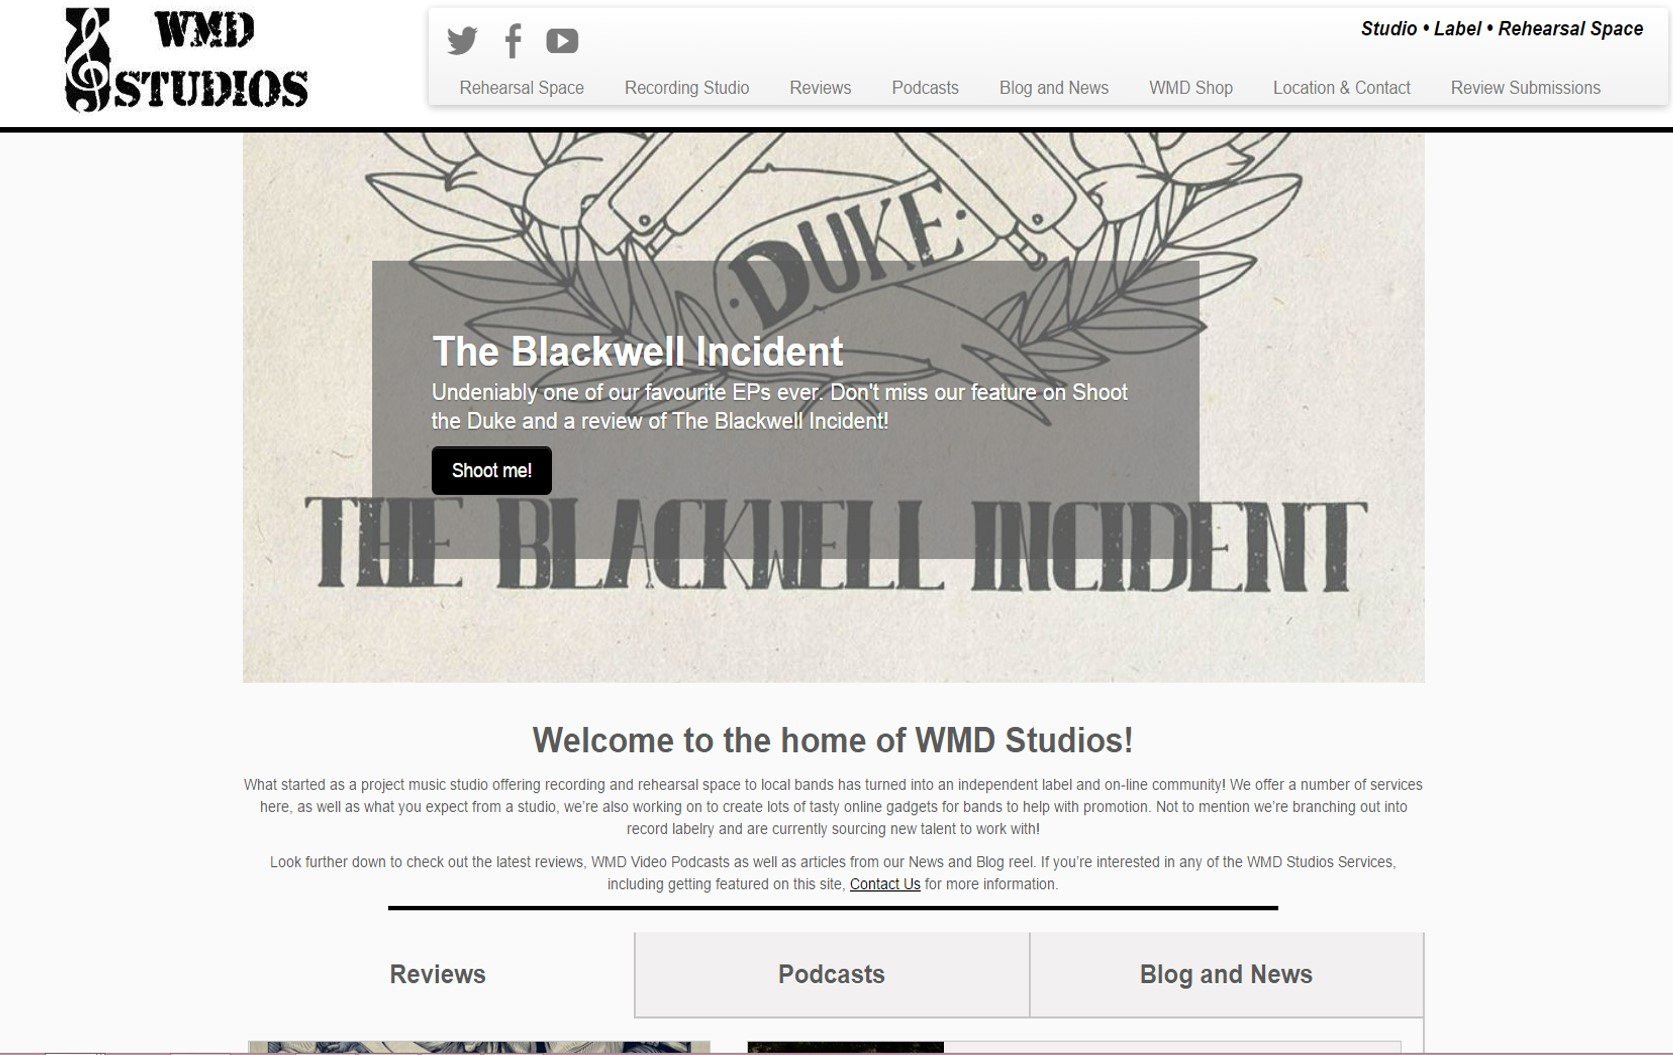 WMD Studios